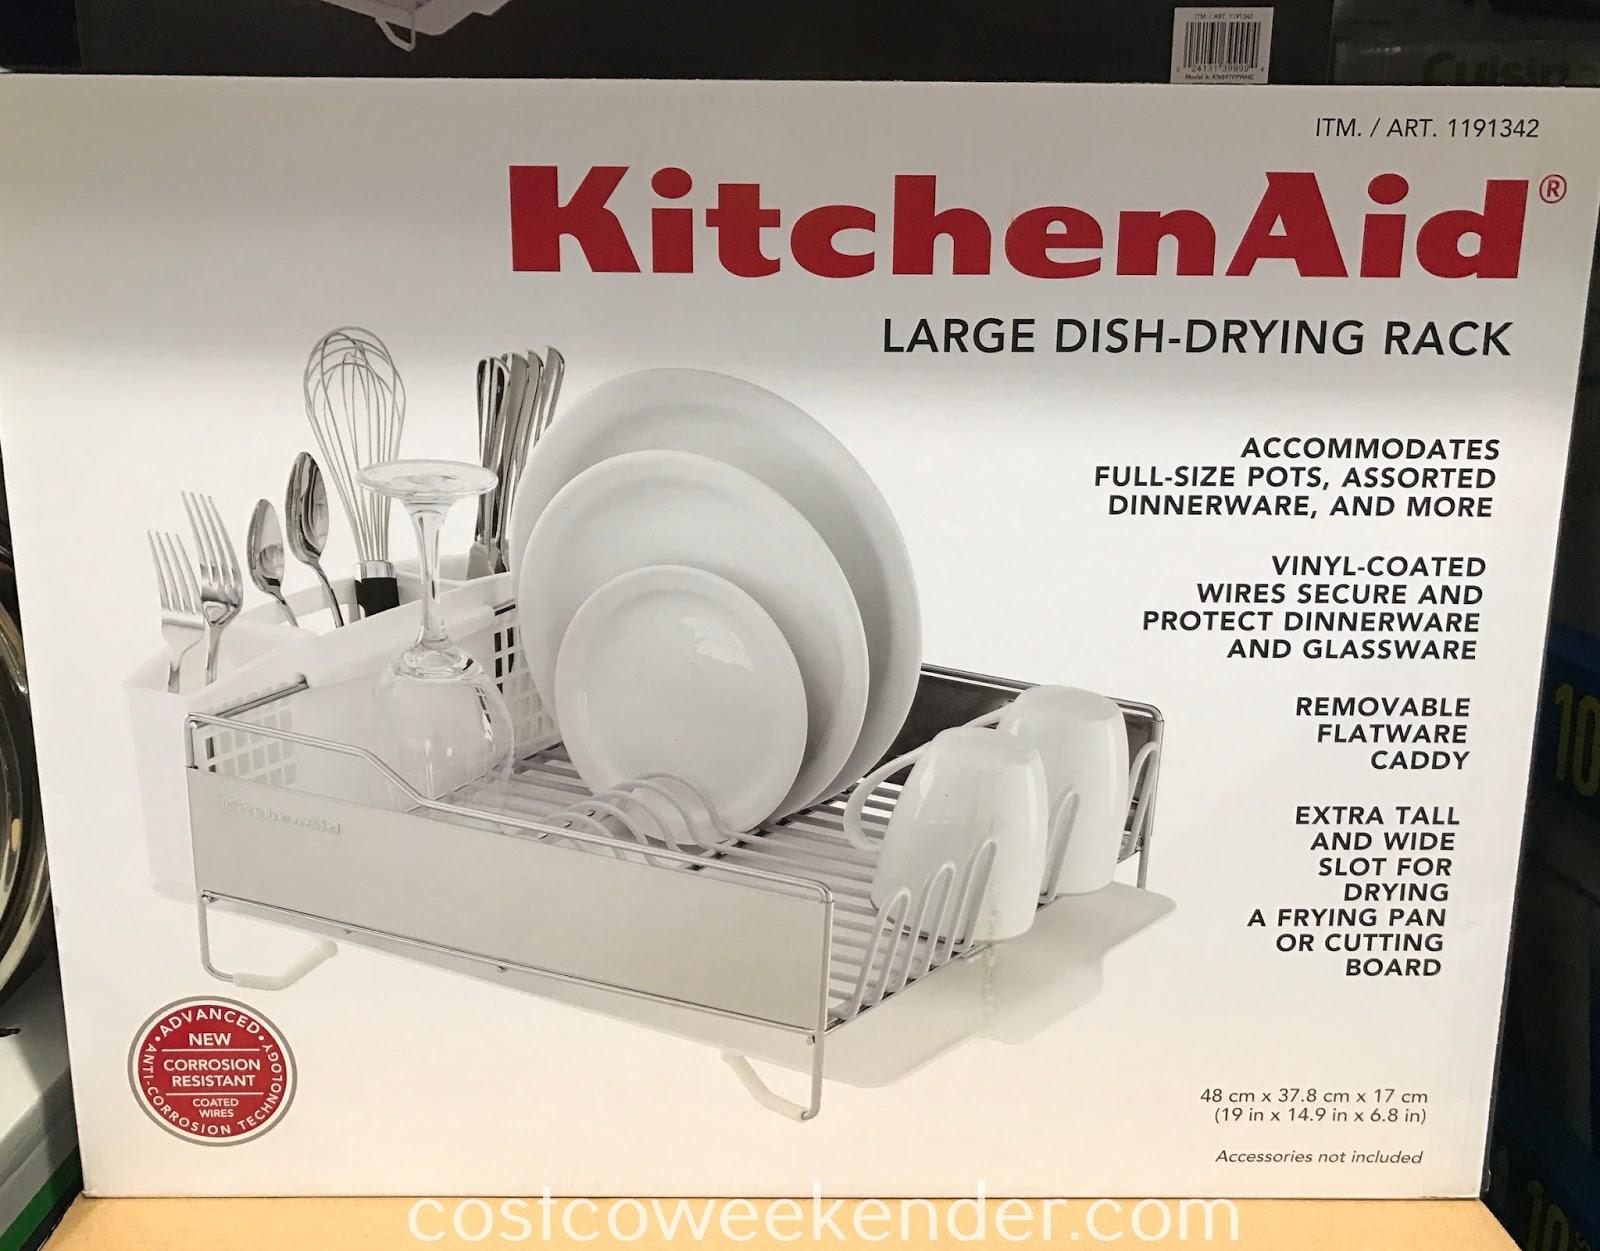 kitchenaid large dish drying rack